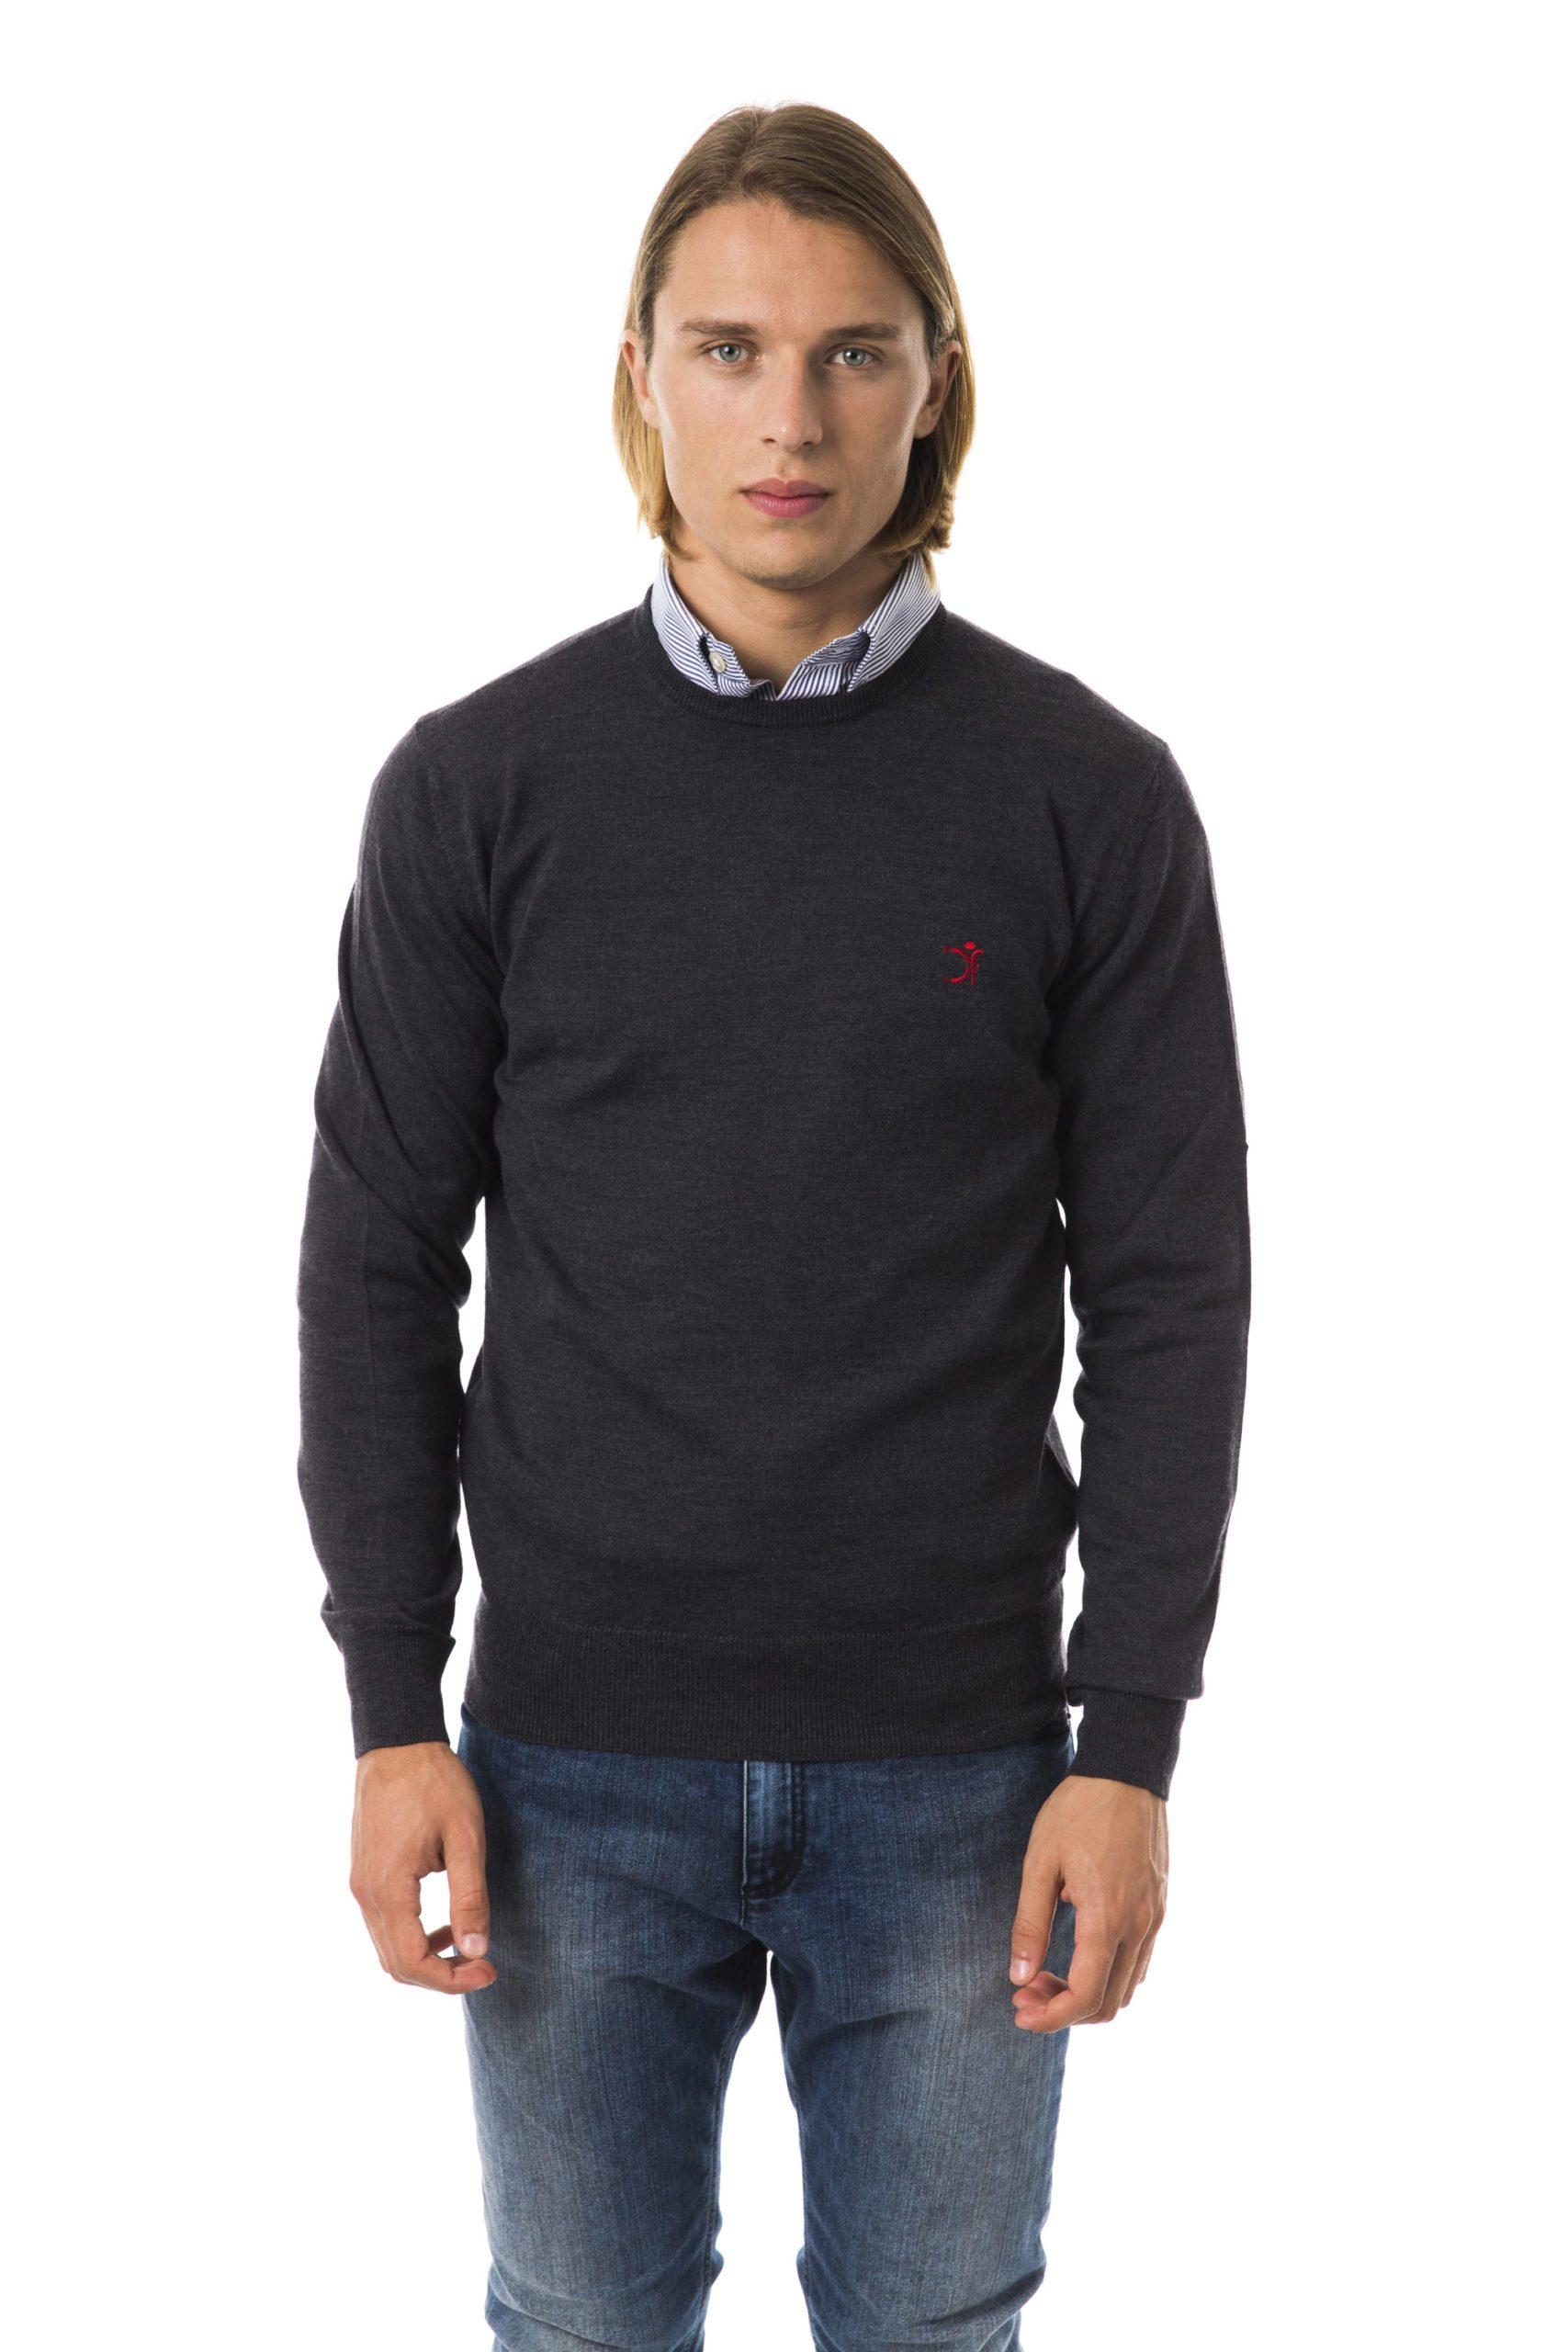 Uominitaliani Men's Antr Sweater Gray UO816642 - XS